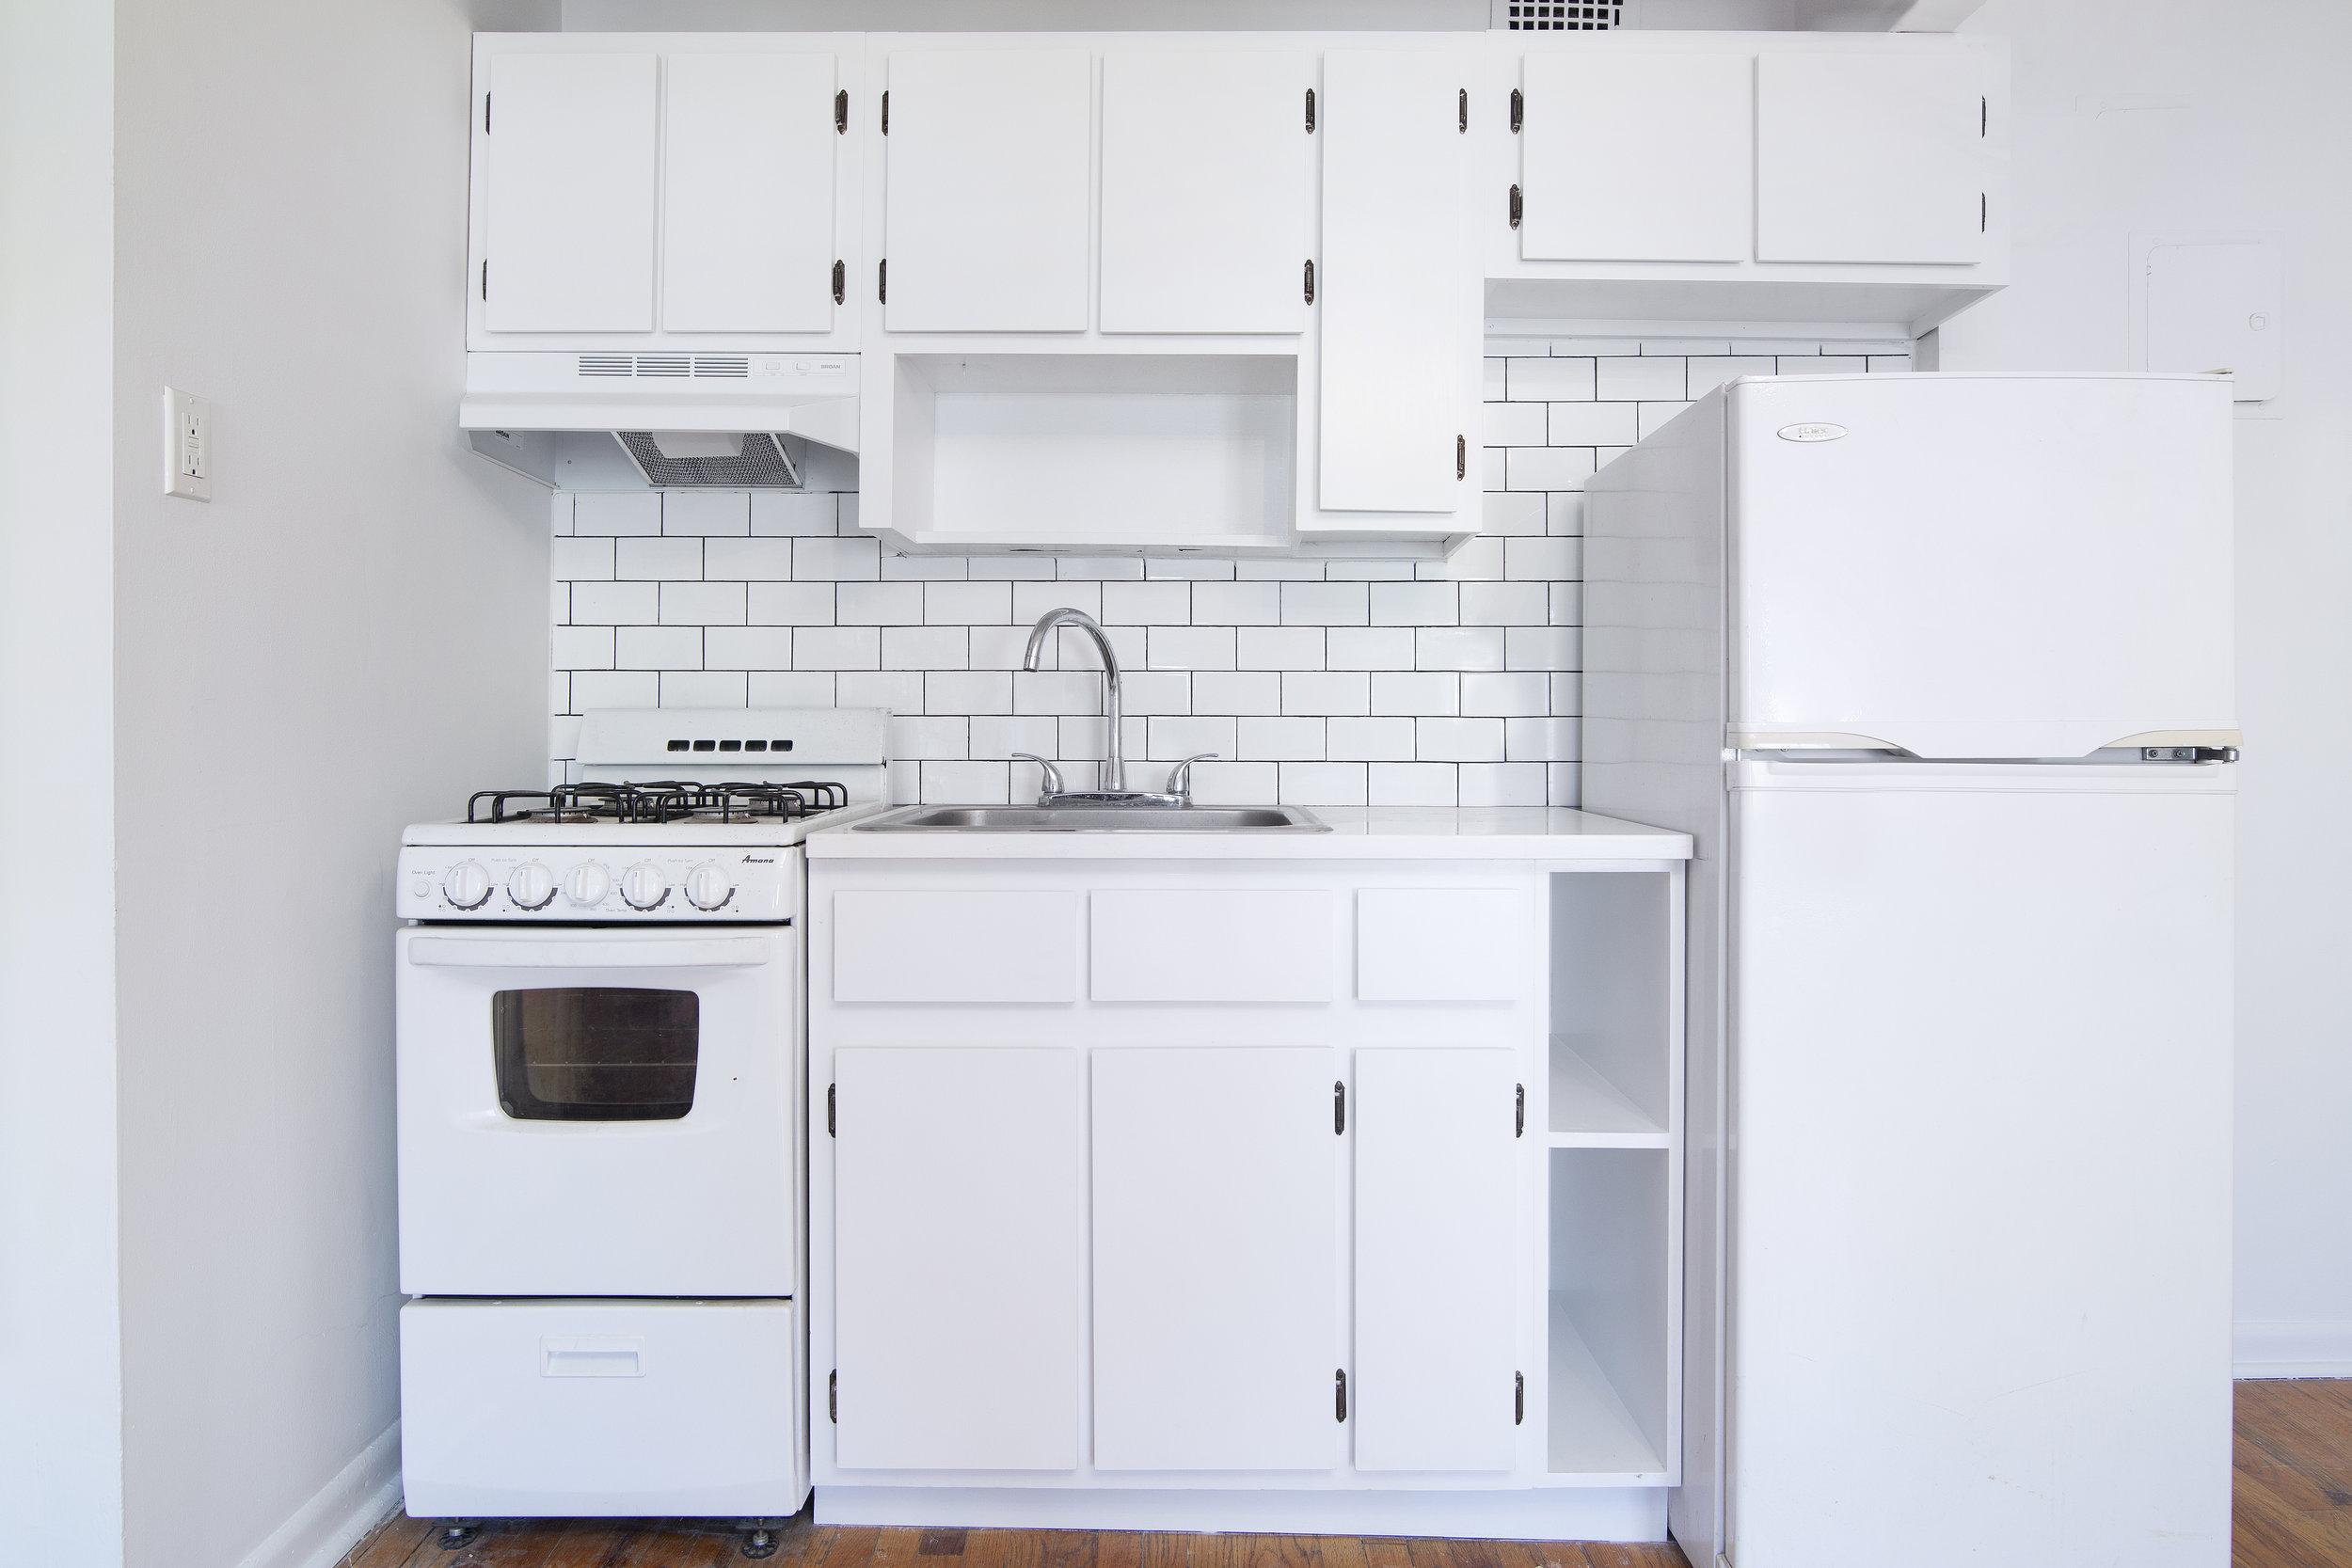 304 Cumberland Street Apt 3F Kitchen.jpg